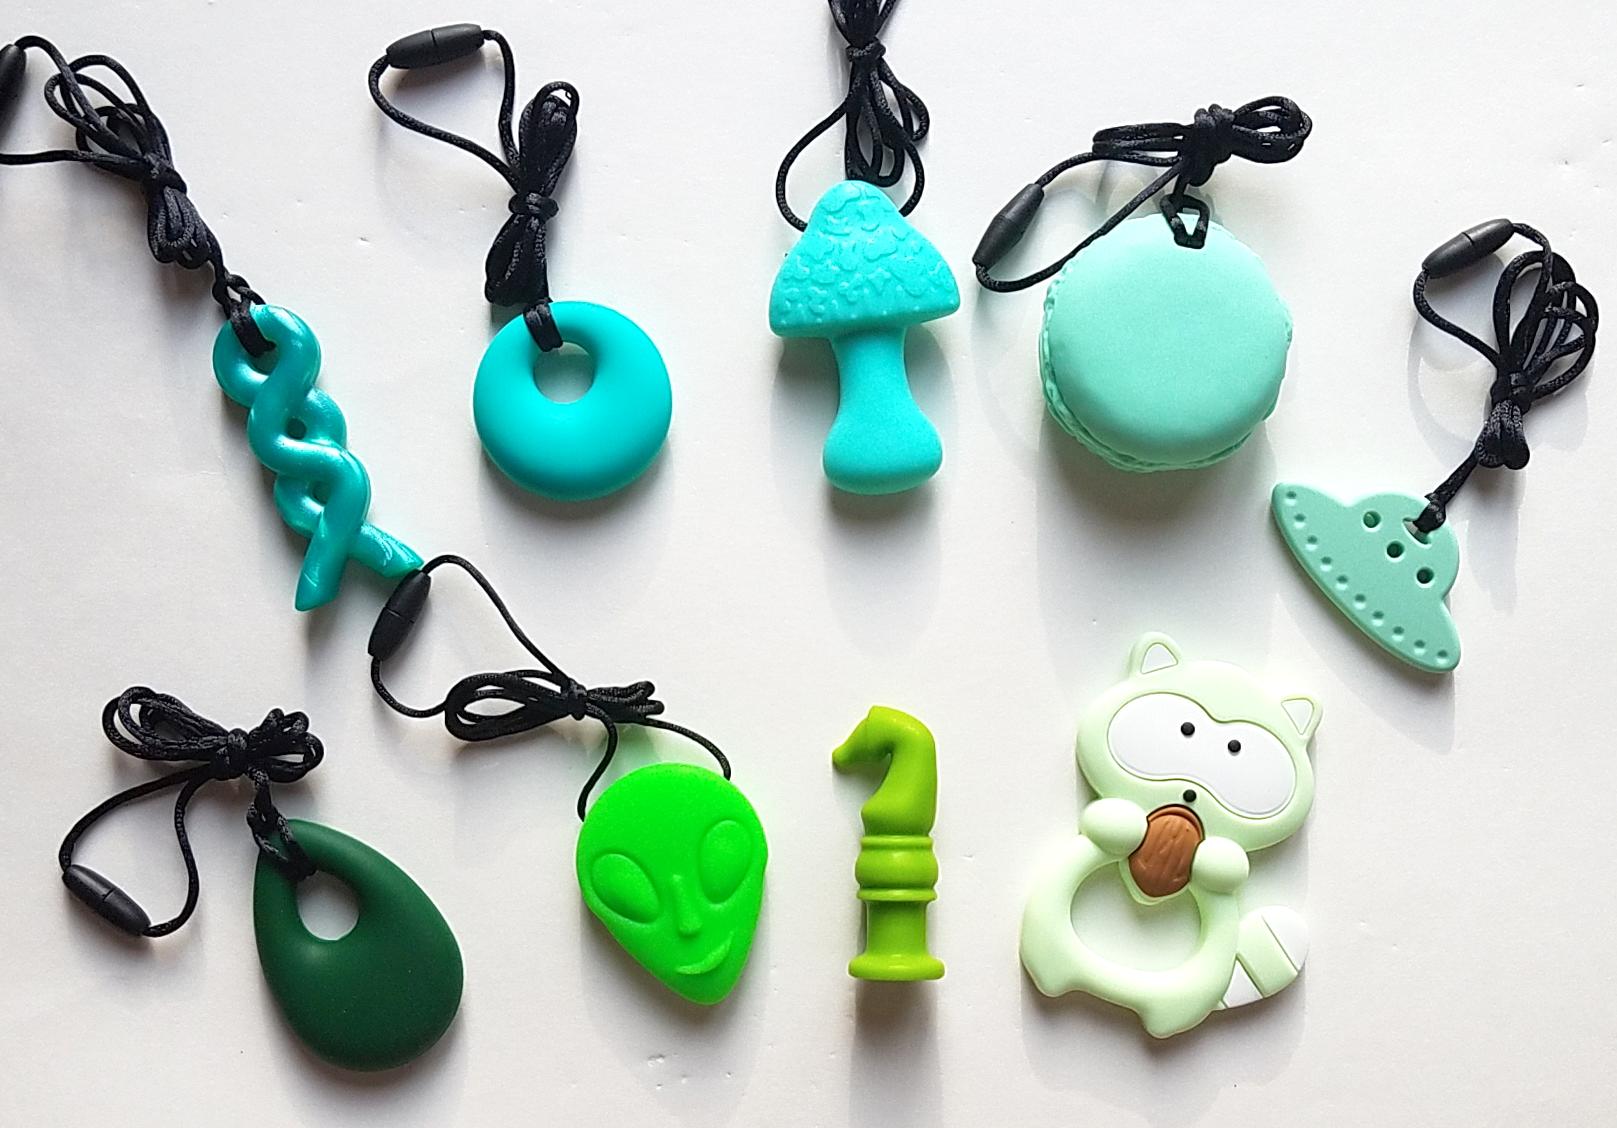 Clockwise from top left: Azure braid, turquoise annular, mint mushroom, green macaron, mint UFO, green raccoon, lime green chew knight, neon green alien, emerald droplet.